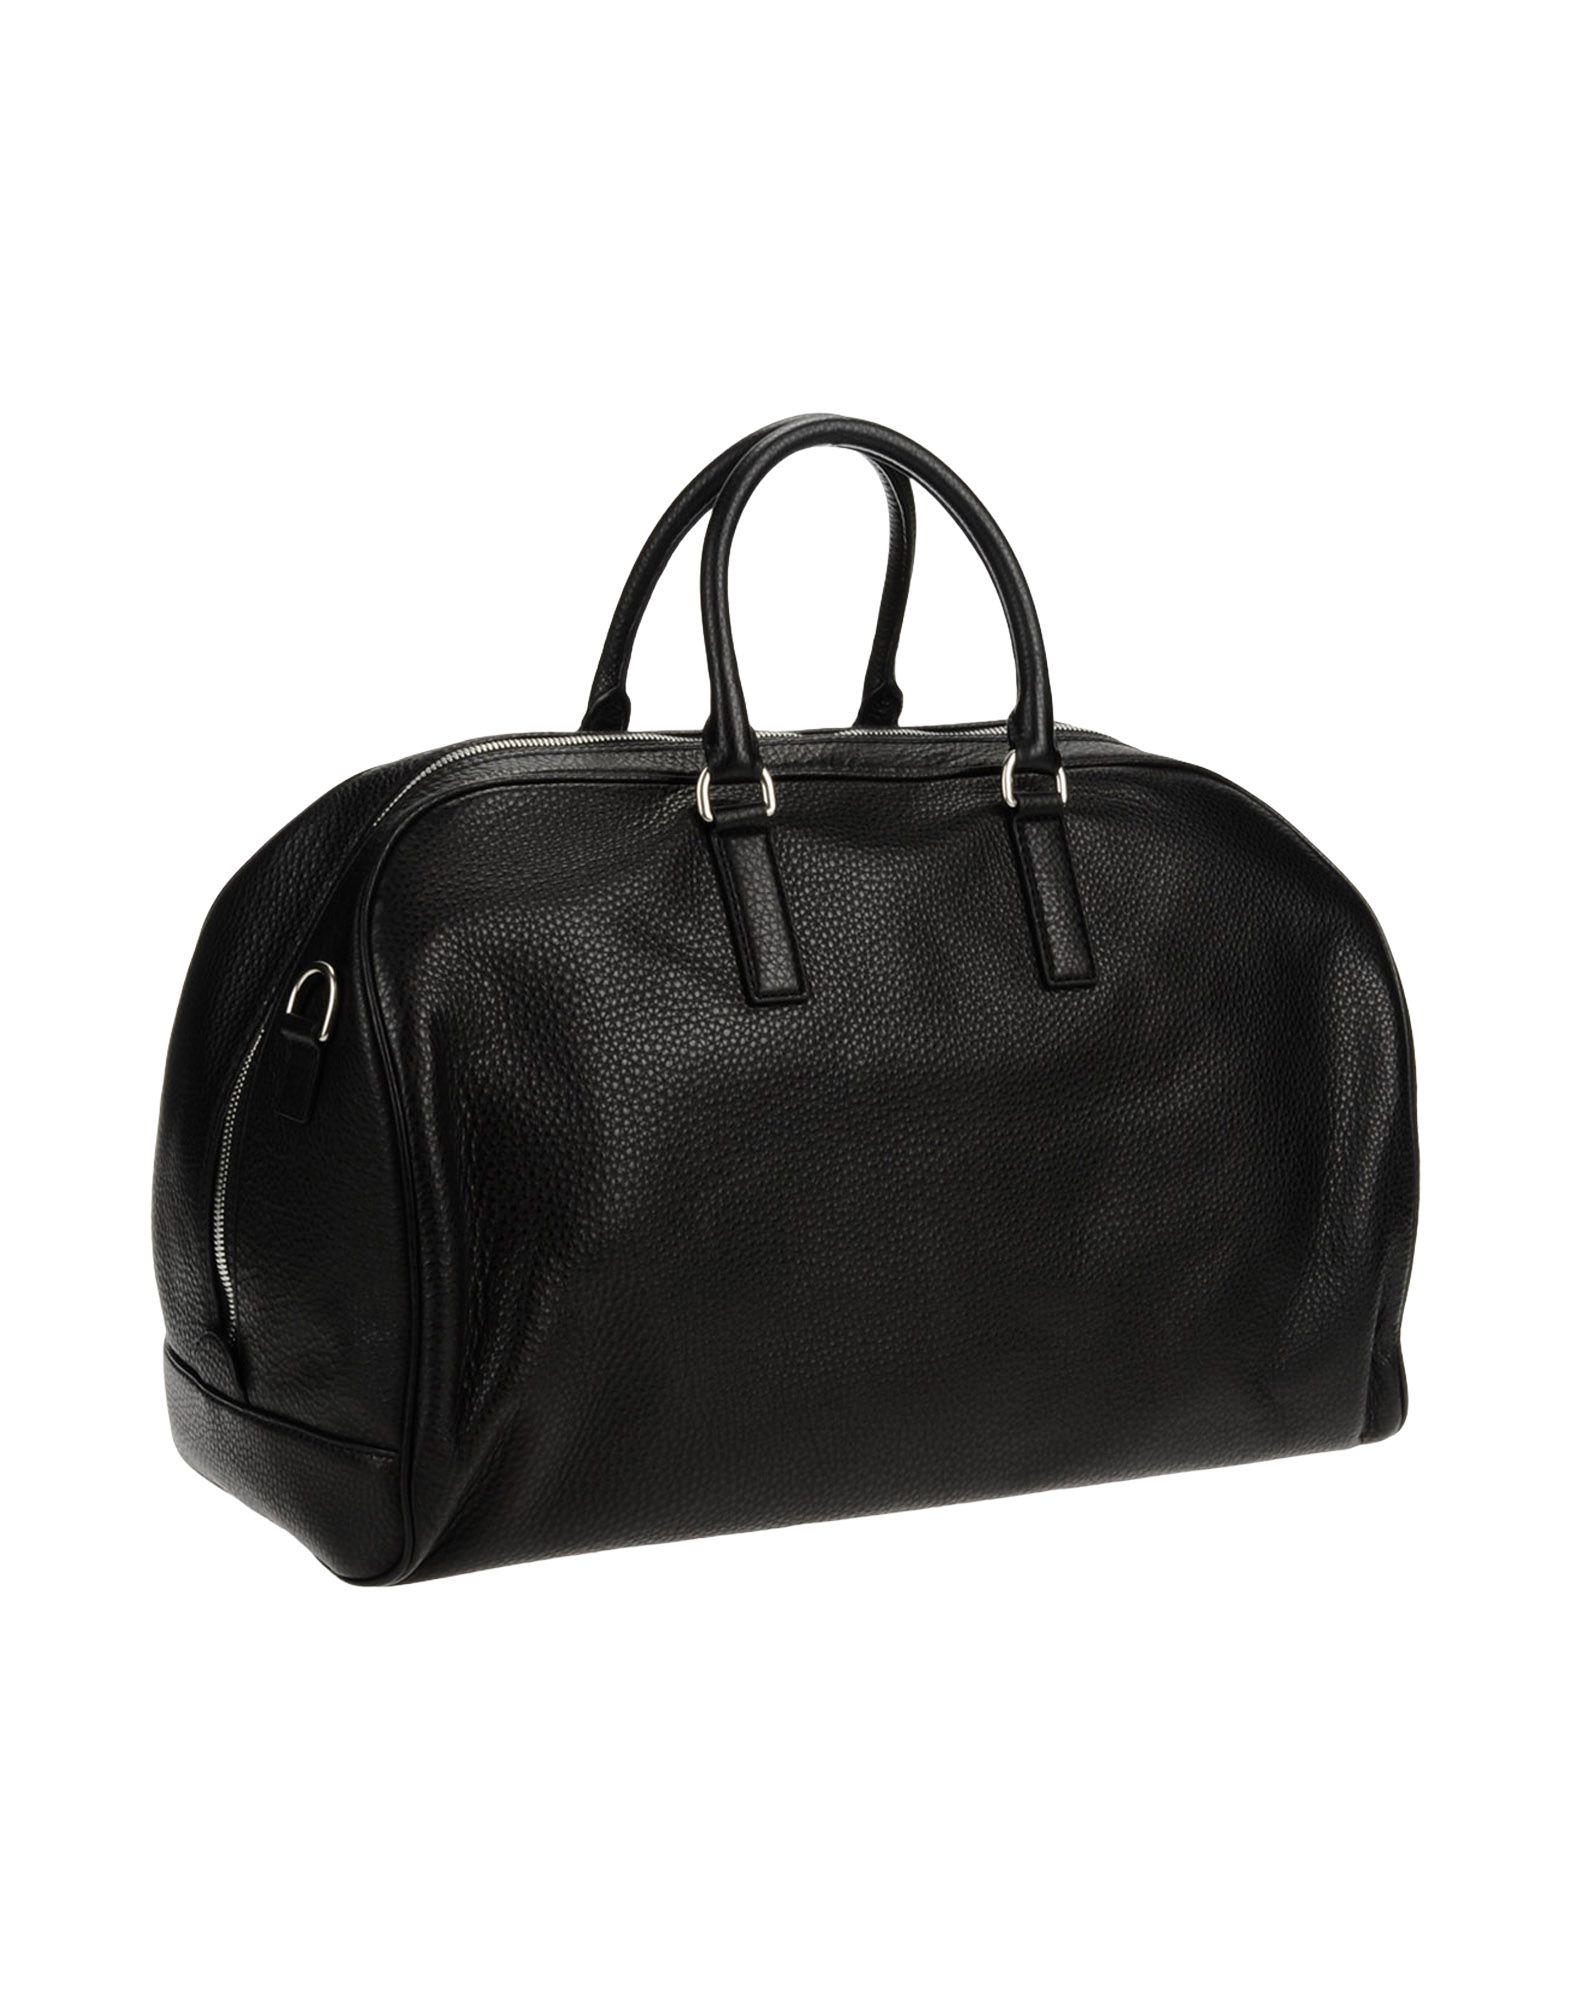 8a03b3ca45fe ... authentic lyst michael kors travel duffel bag in black for men a6022  2b01f